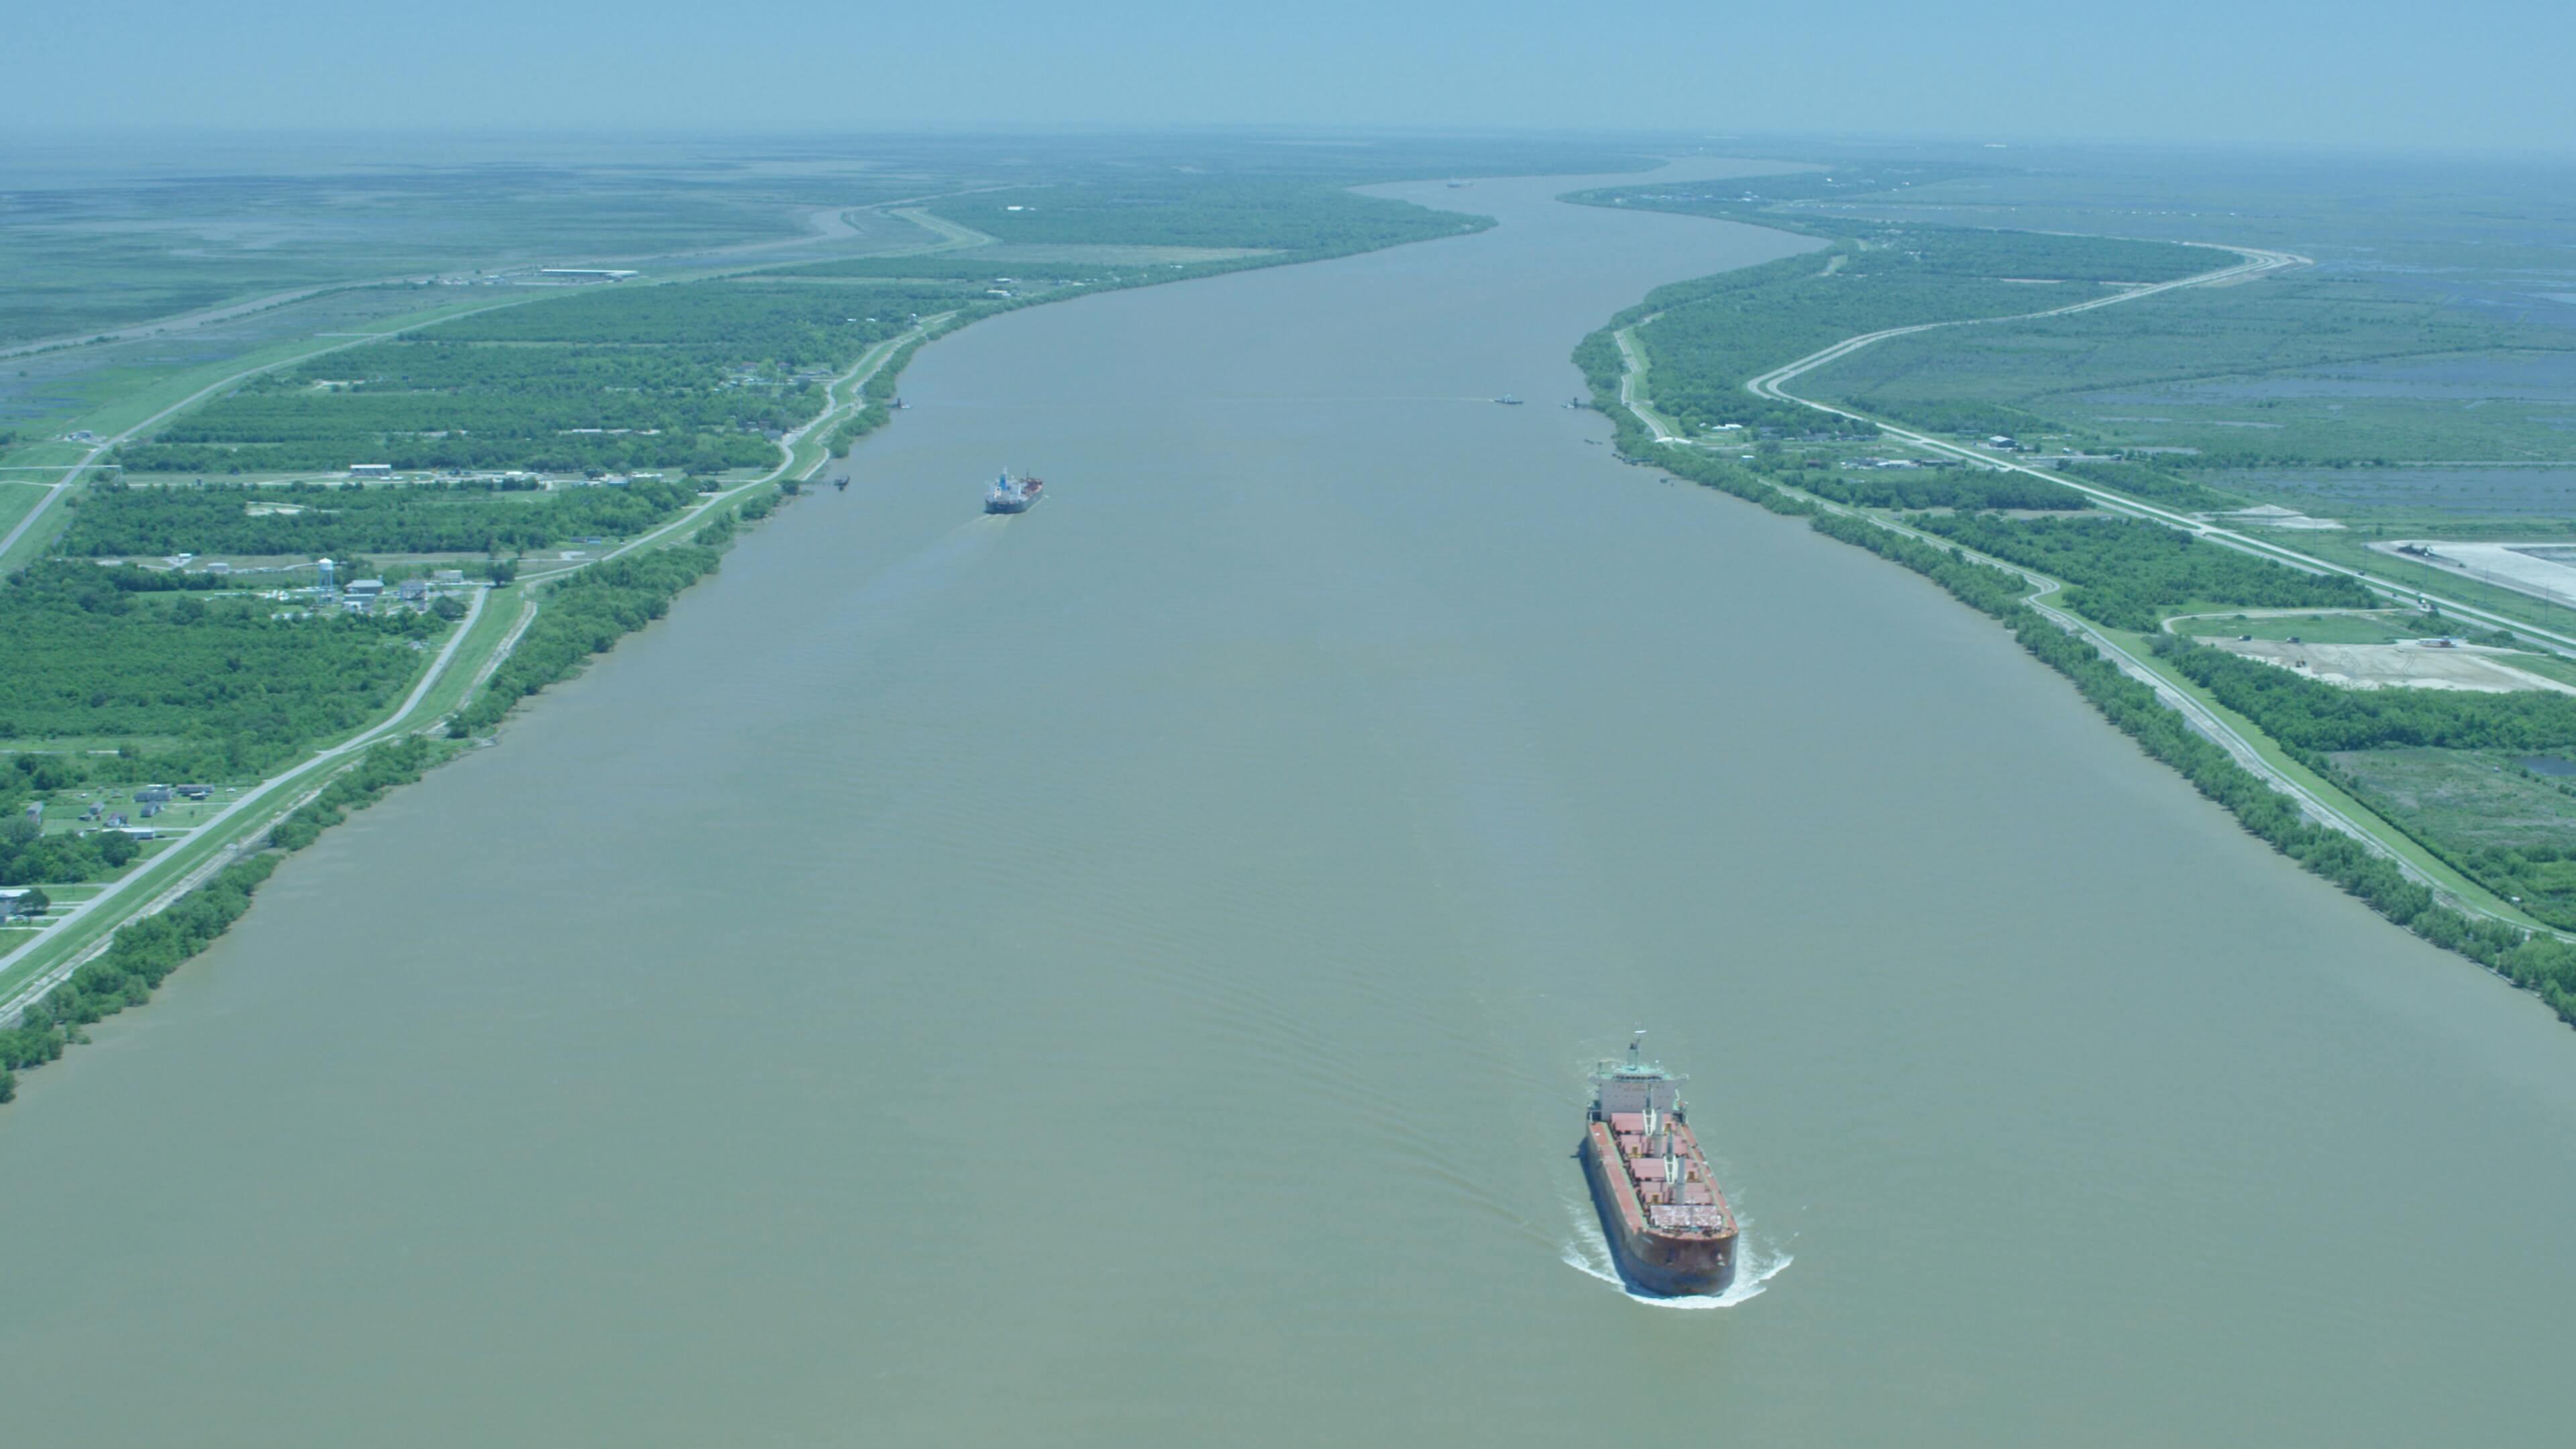 boat on the mississsippi river